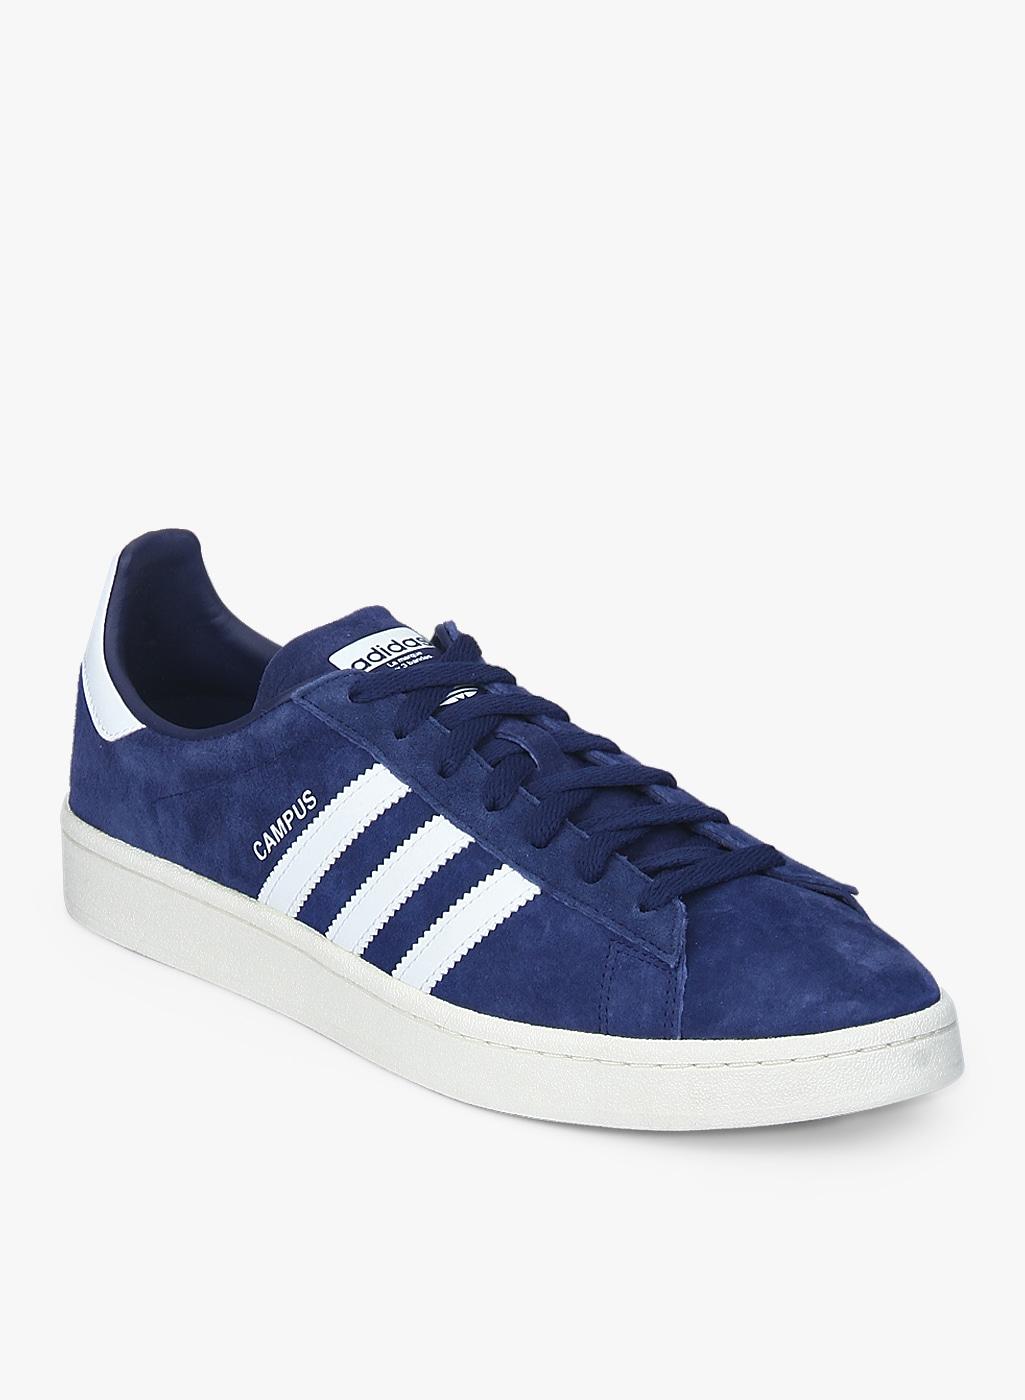 a0492ab10e33 Adidas Originals - Buy Adidas Originals Products Online